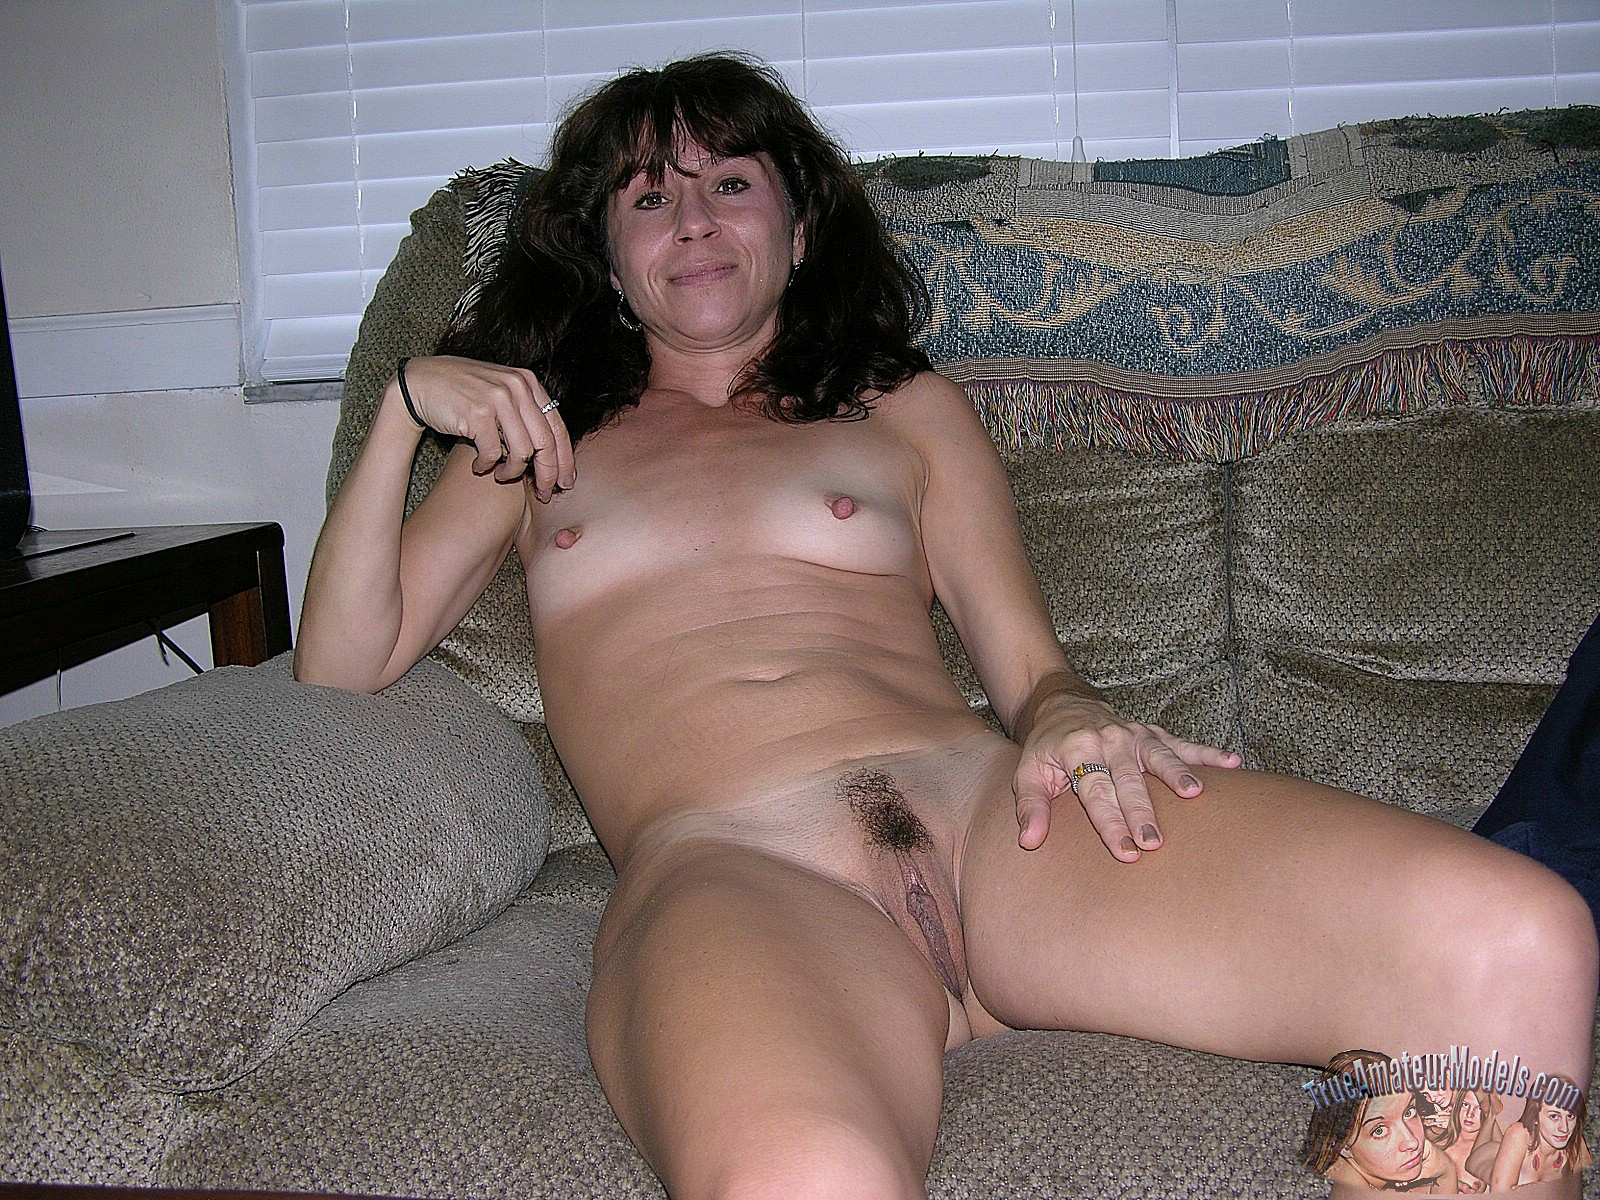 Sara jean underwood nude wallpaper